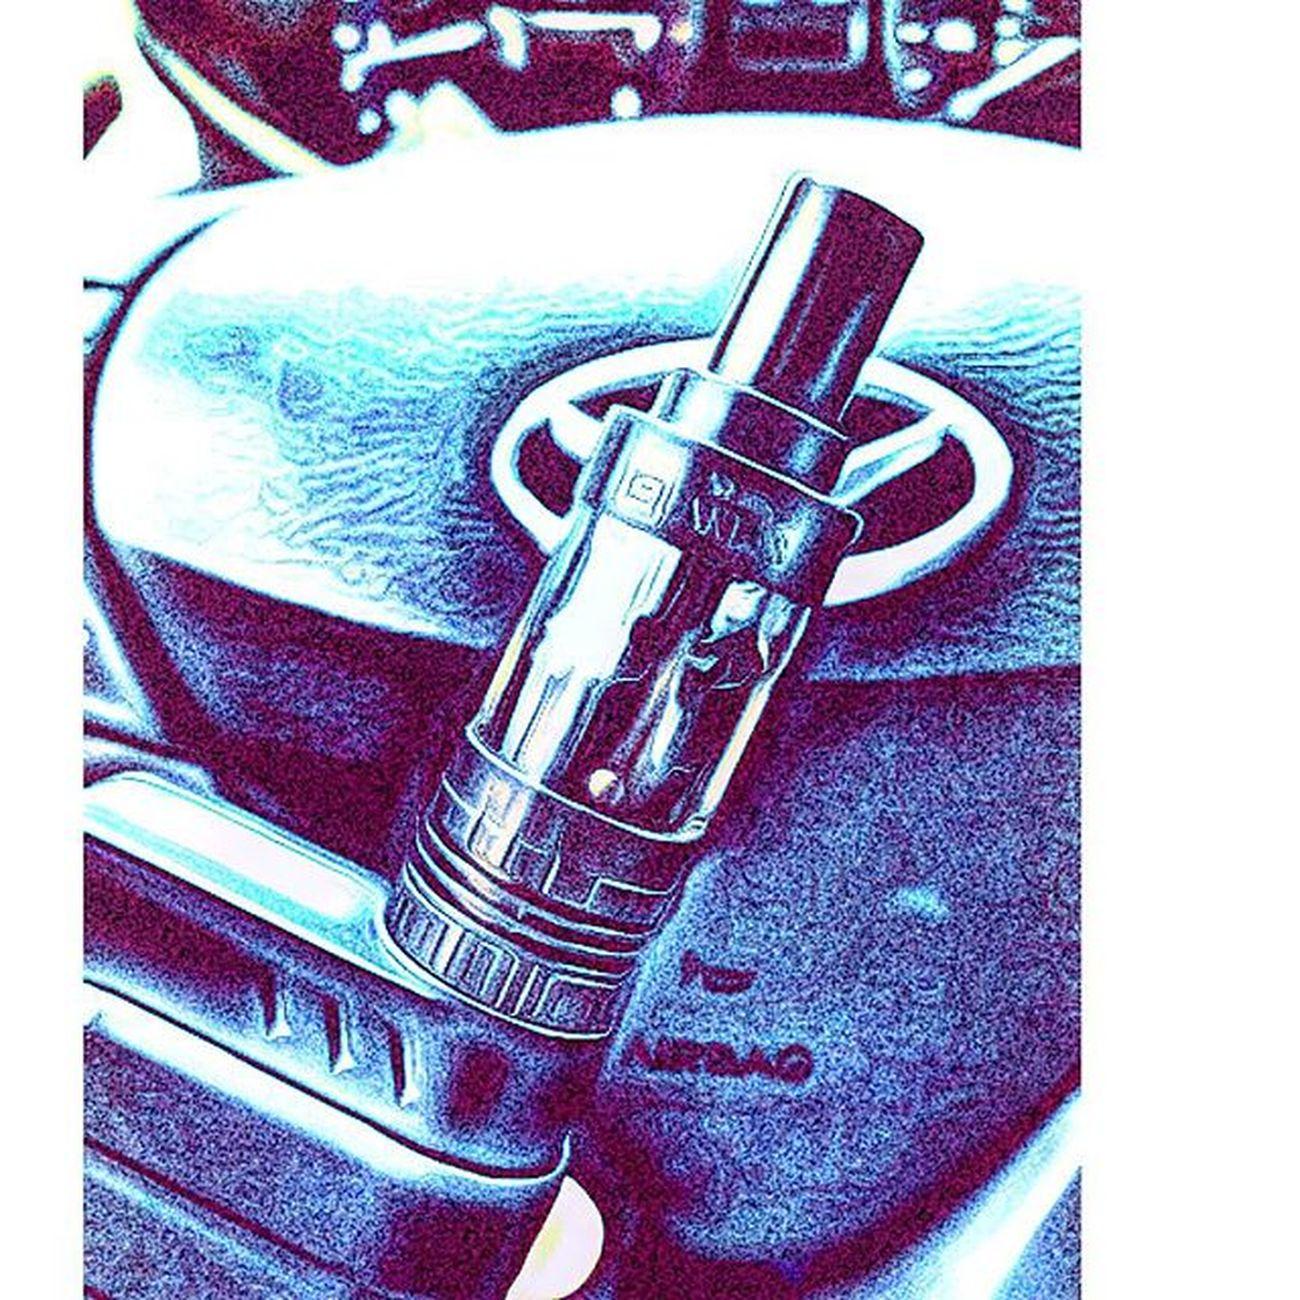 Herkules herkales!!! Vape Boxmod Cloudchaser Ejuice Eliquid Vape4life Puffpuffnopas Beastmod Ipv4 Black Herkules  Variablevoltage Variablewattage Temperaturecontrol 100W AllBlackEverything Vapeporn VapeLife Vapelyfe Vaporfanatics Premiumliquid Vapeme Cloudchasers